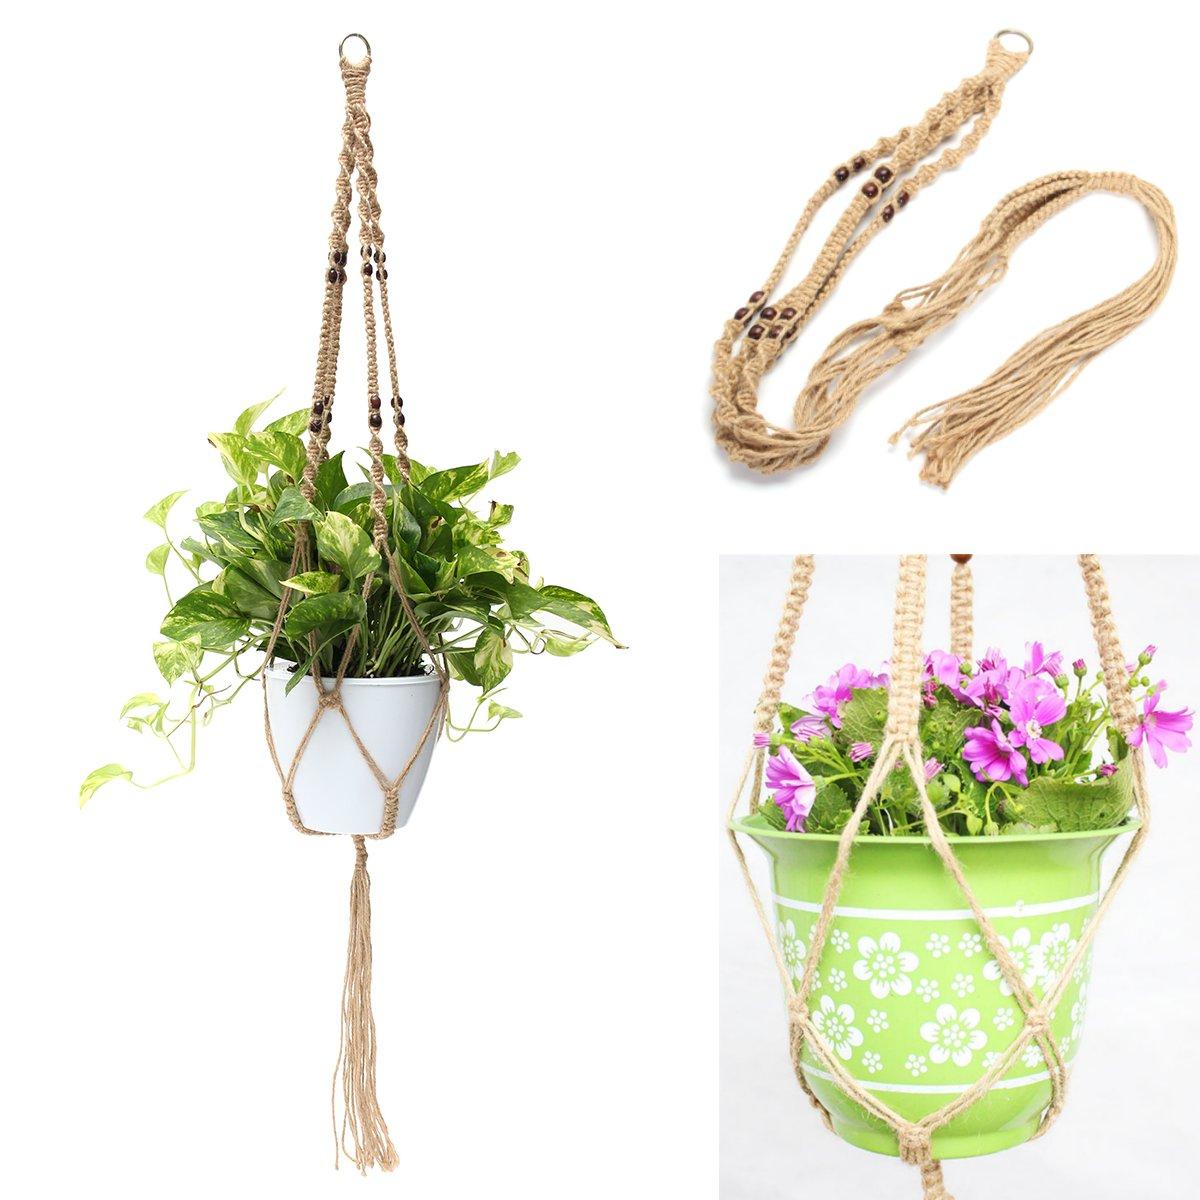 KiWarm Top Quality Plant Hanger Macrame Jute Rope Hanging Pots Basket Planter Holder Balcony Macrame Cord Rope